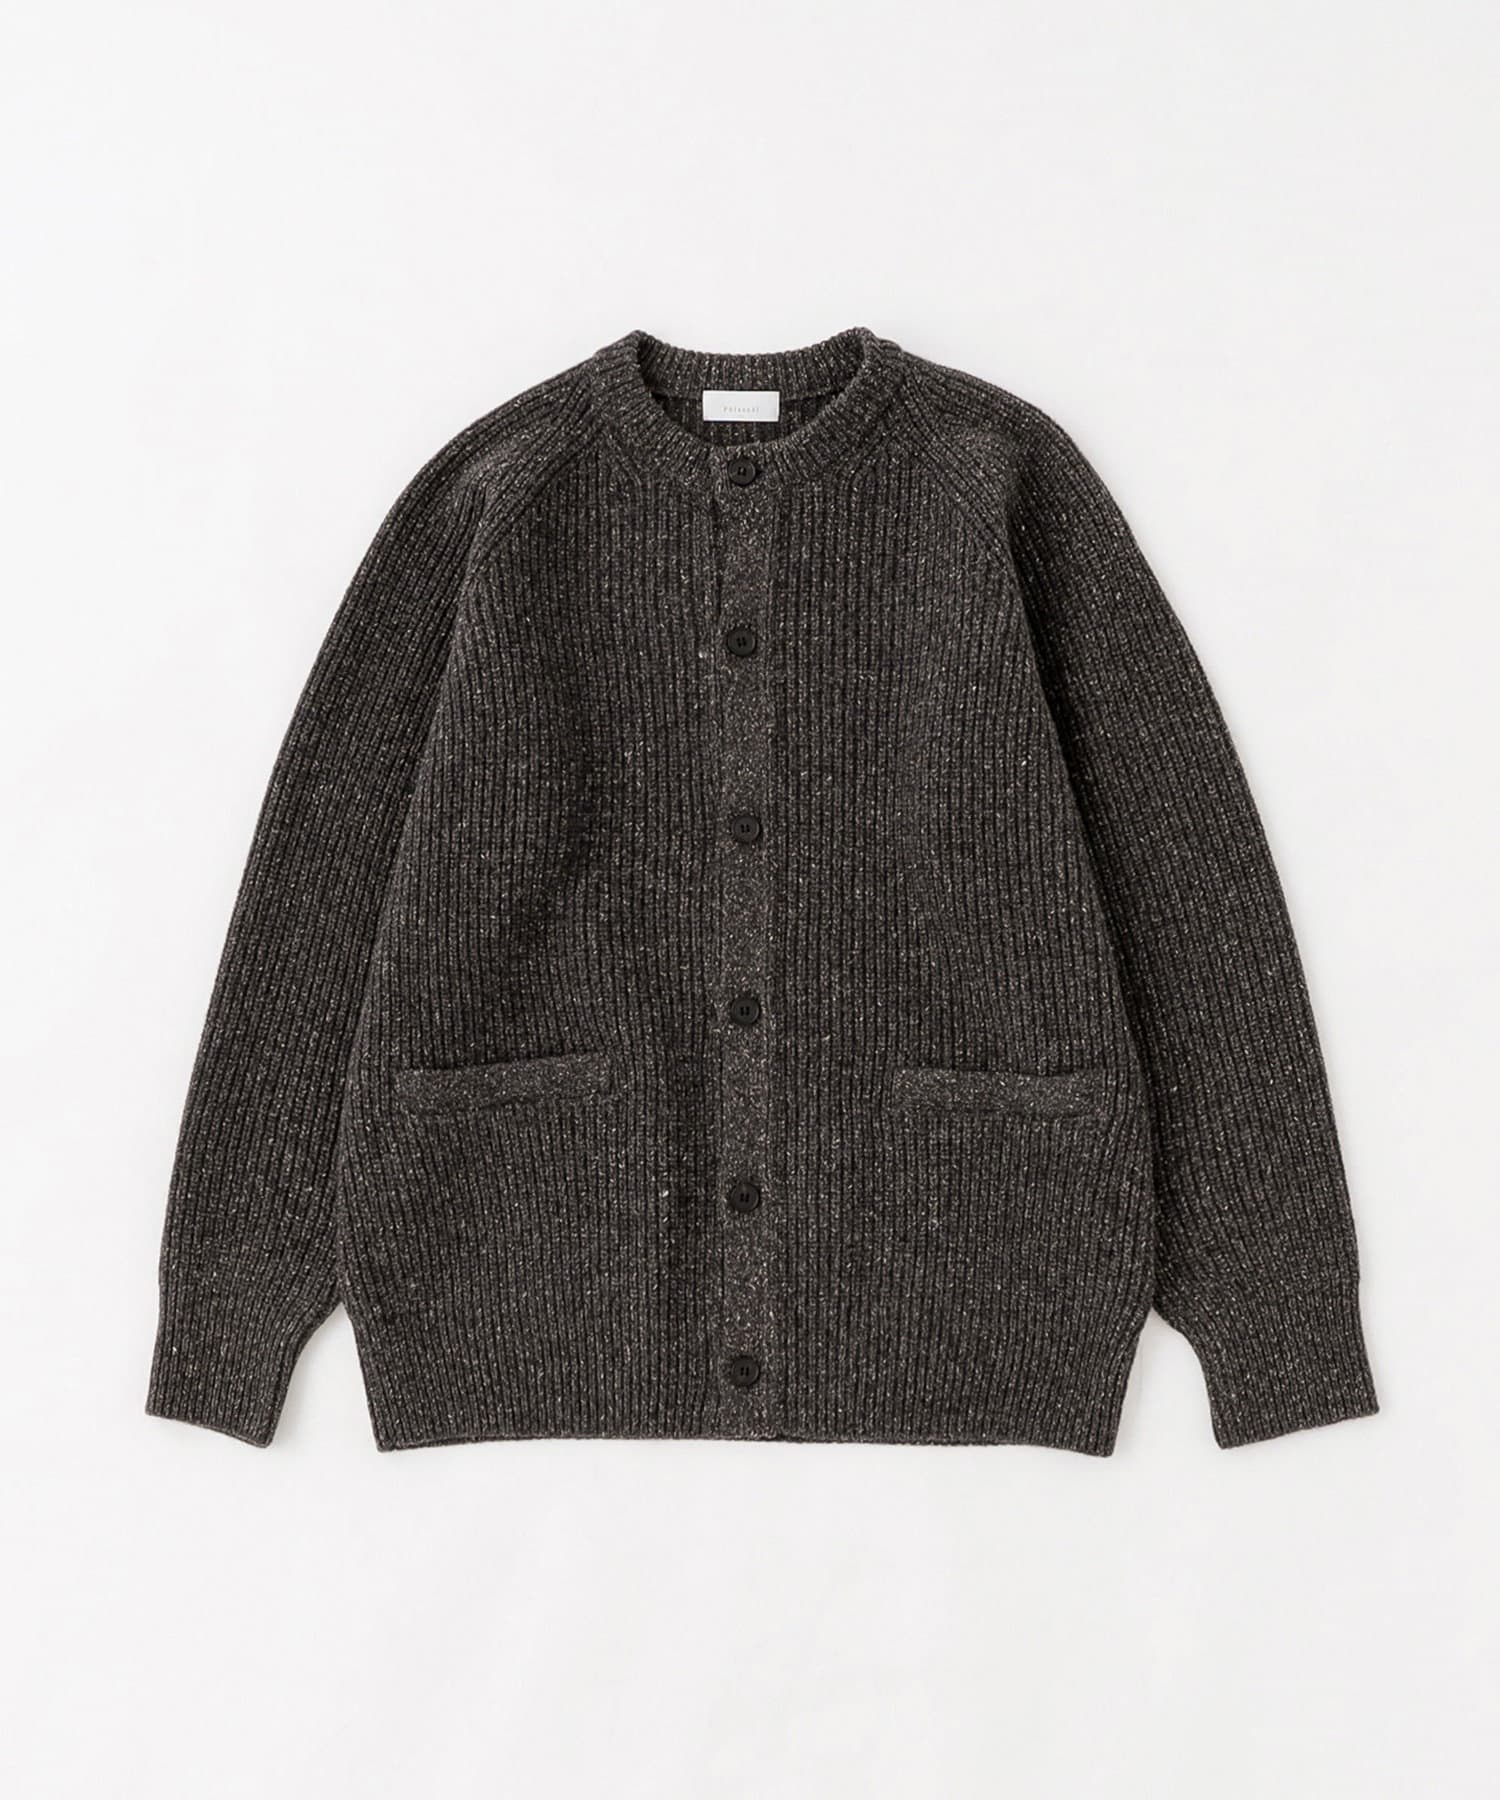 BLOOM&BRANCH(ブルームアンドブランチ) Phlannèl / mens Cowichan Sweater